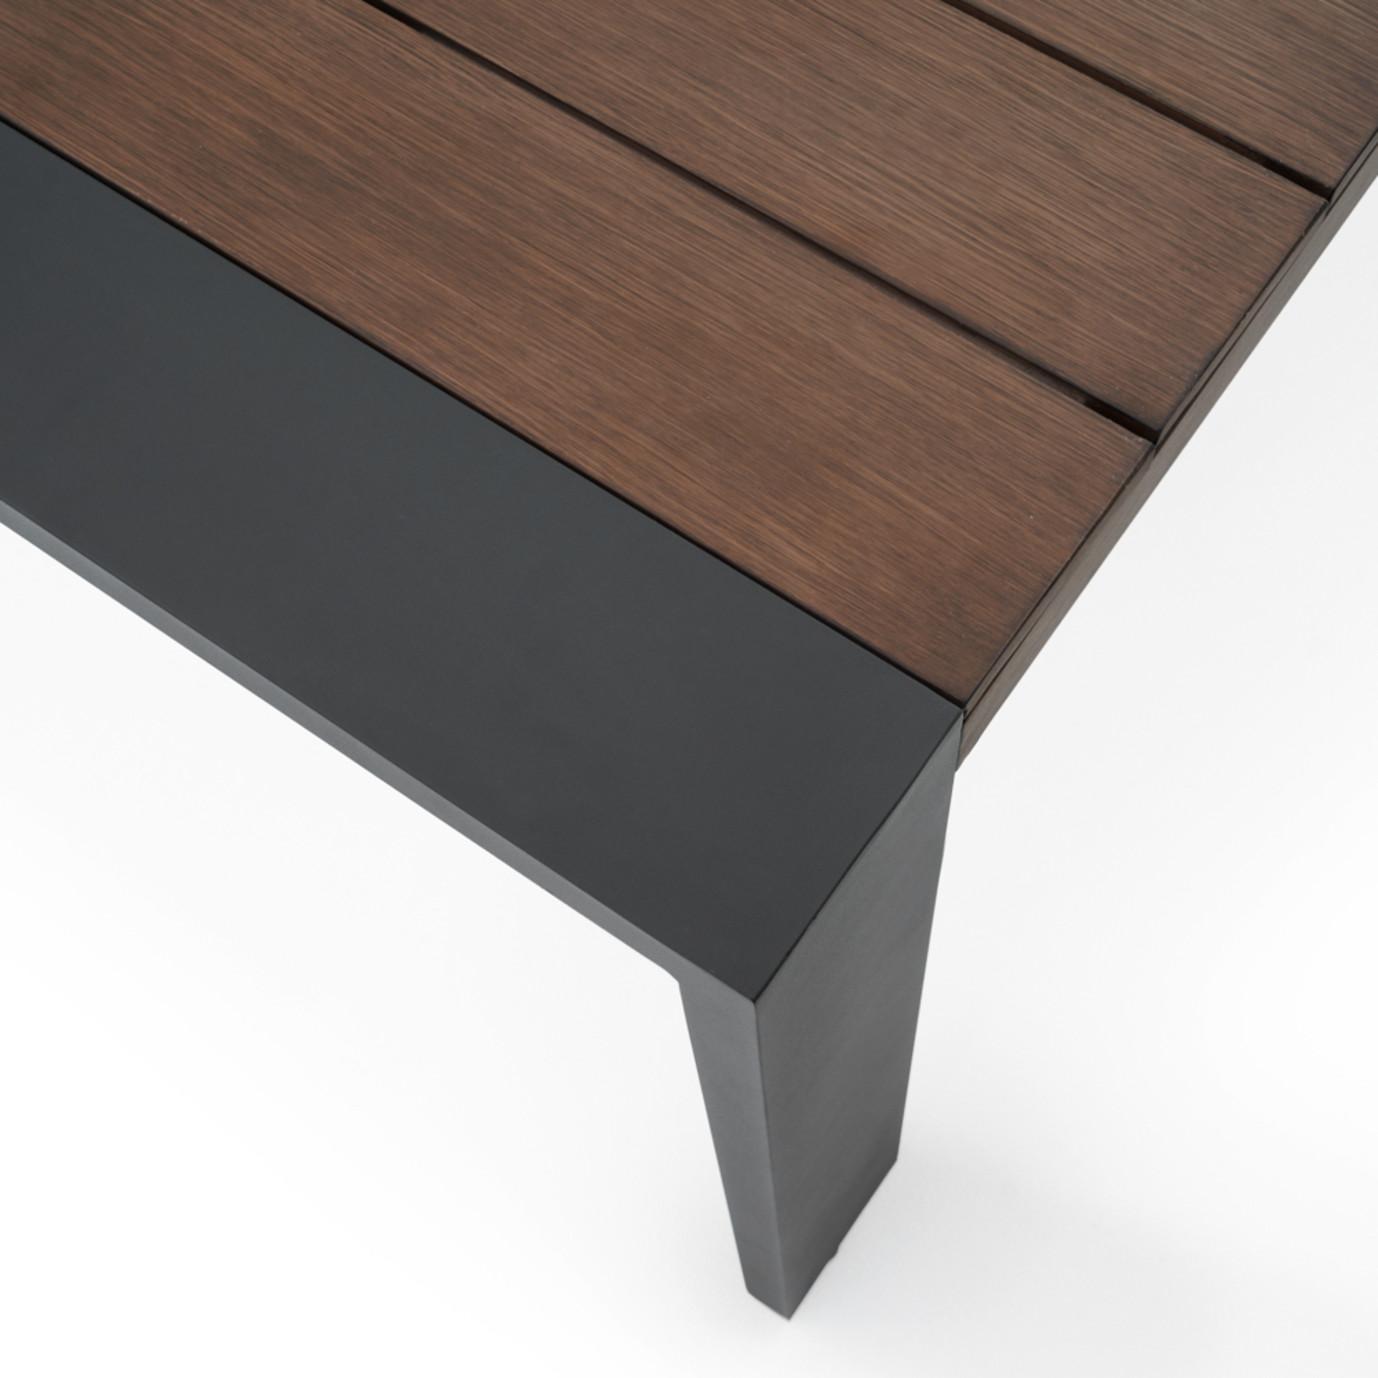 Milo™ Gray 9pc Dining Set - Charcoal Gray